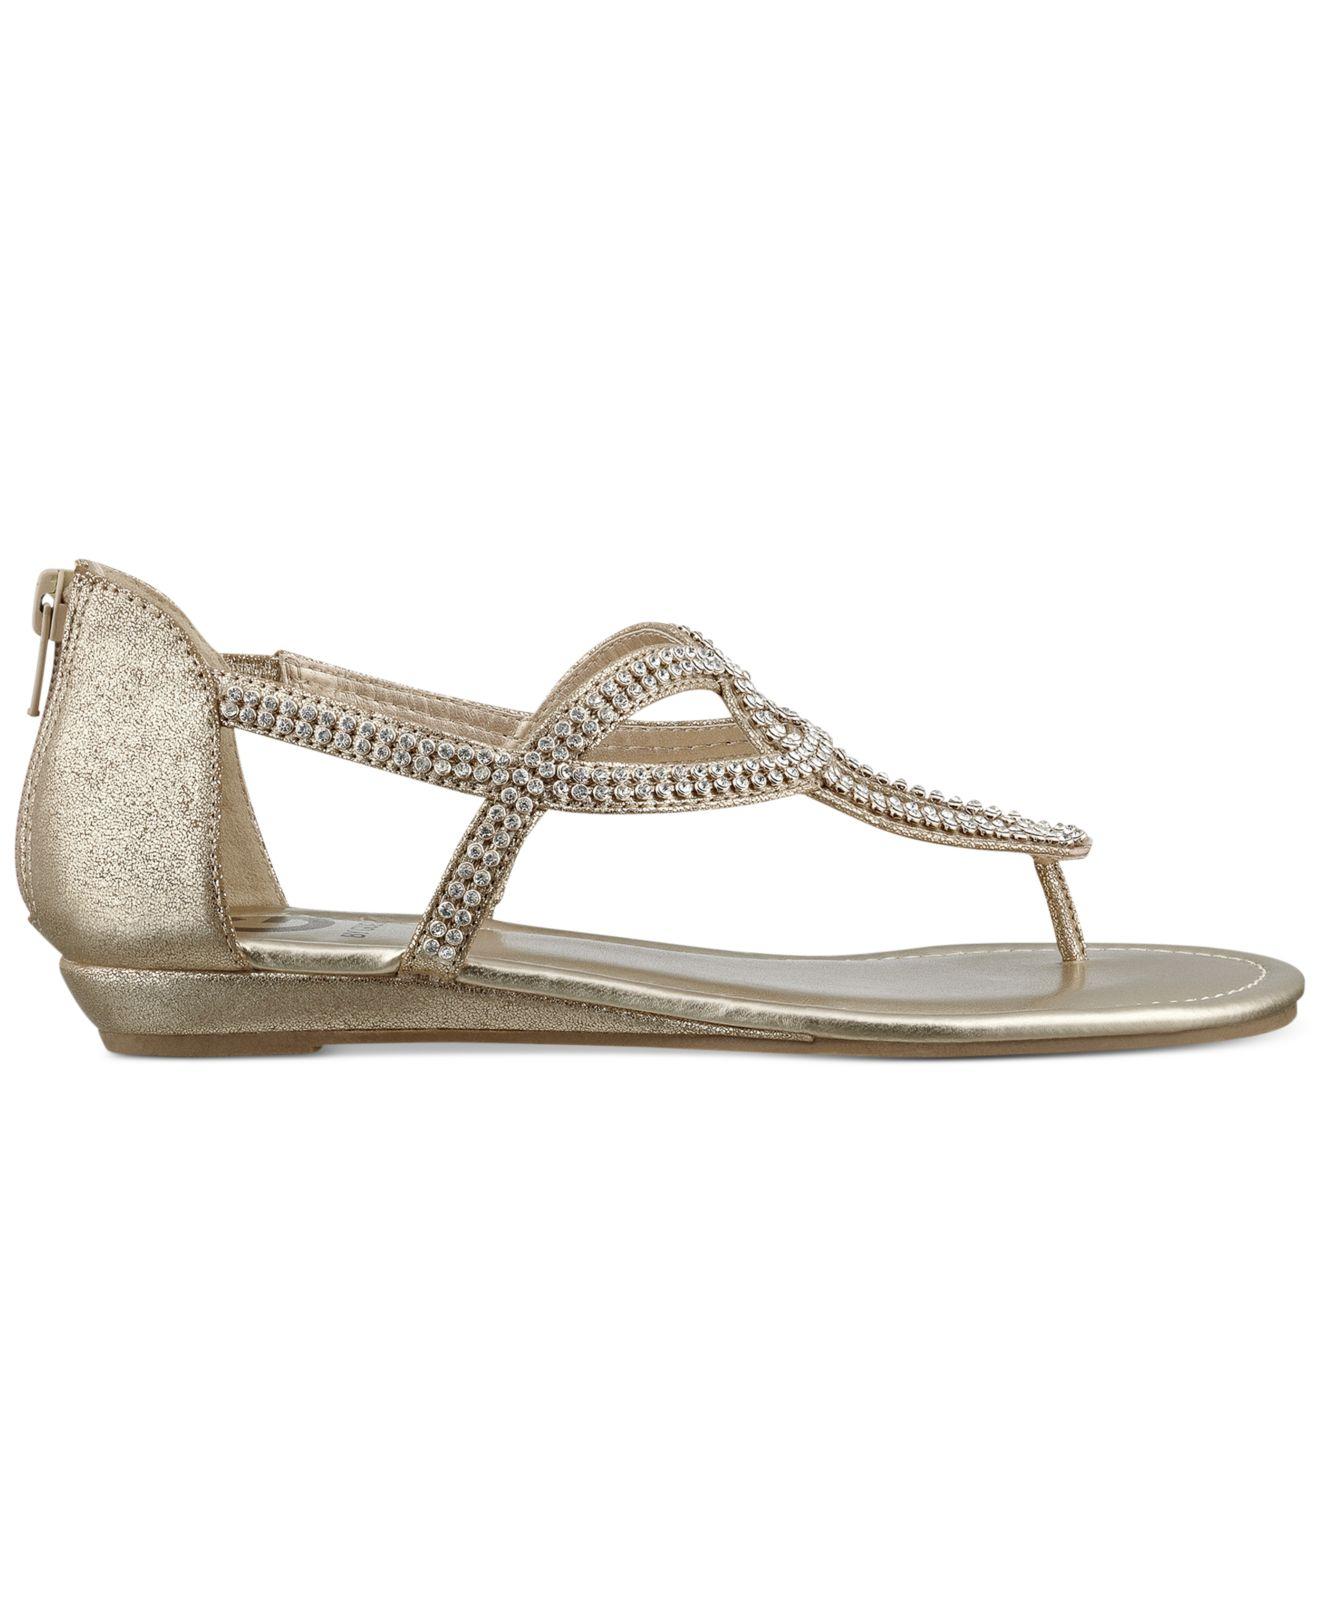 0a4b5c861 Lyst - G by Guess Women S Jamila Rhinestone Flat Thong Sandals in ...